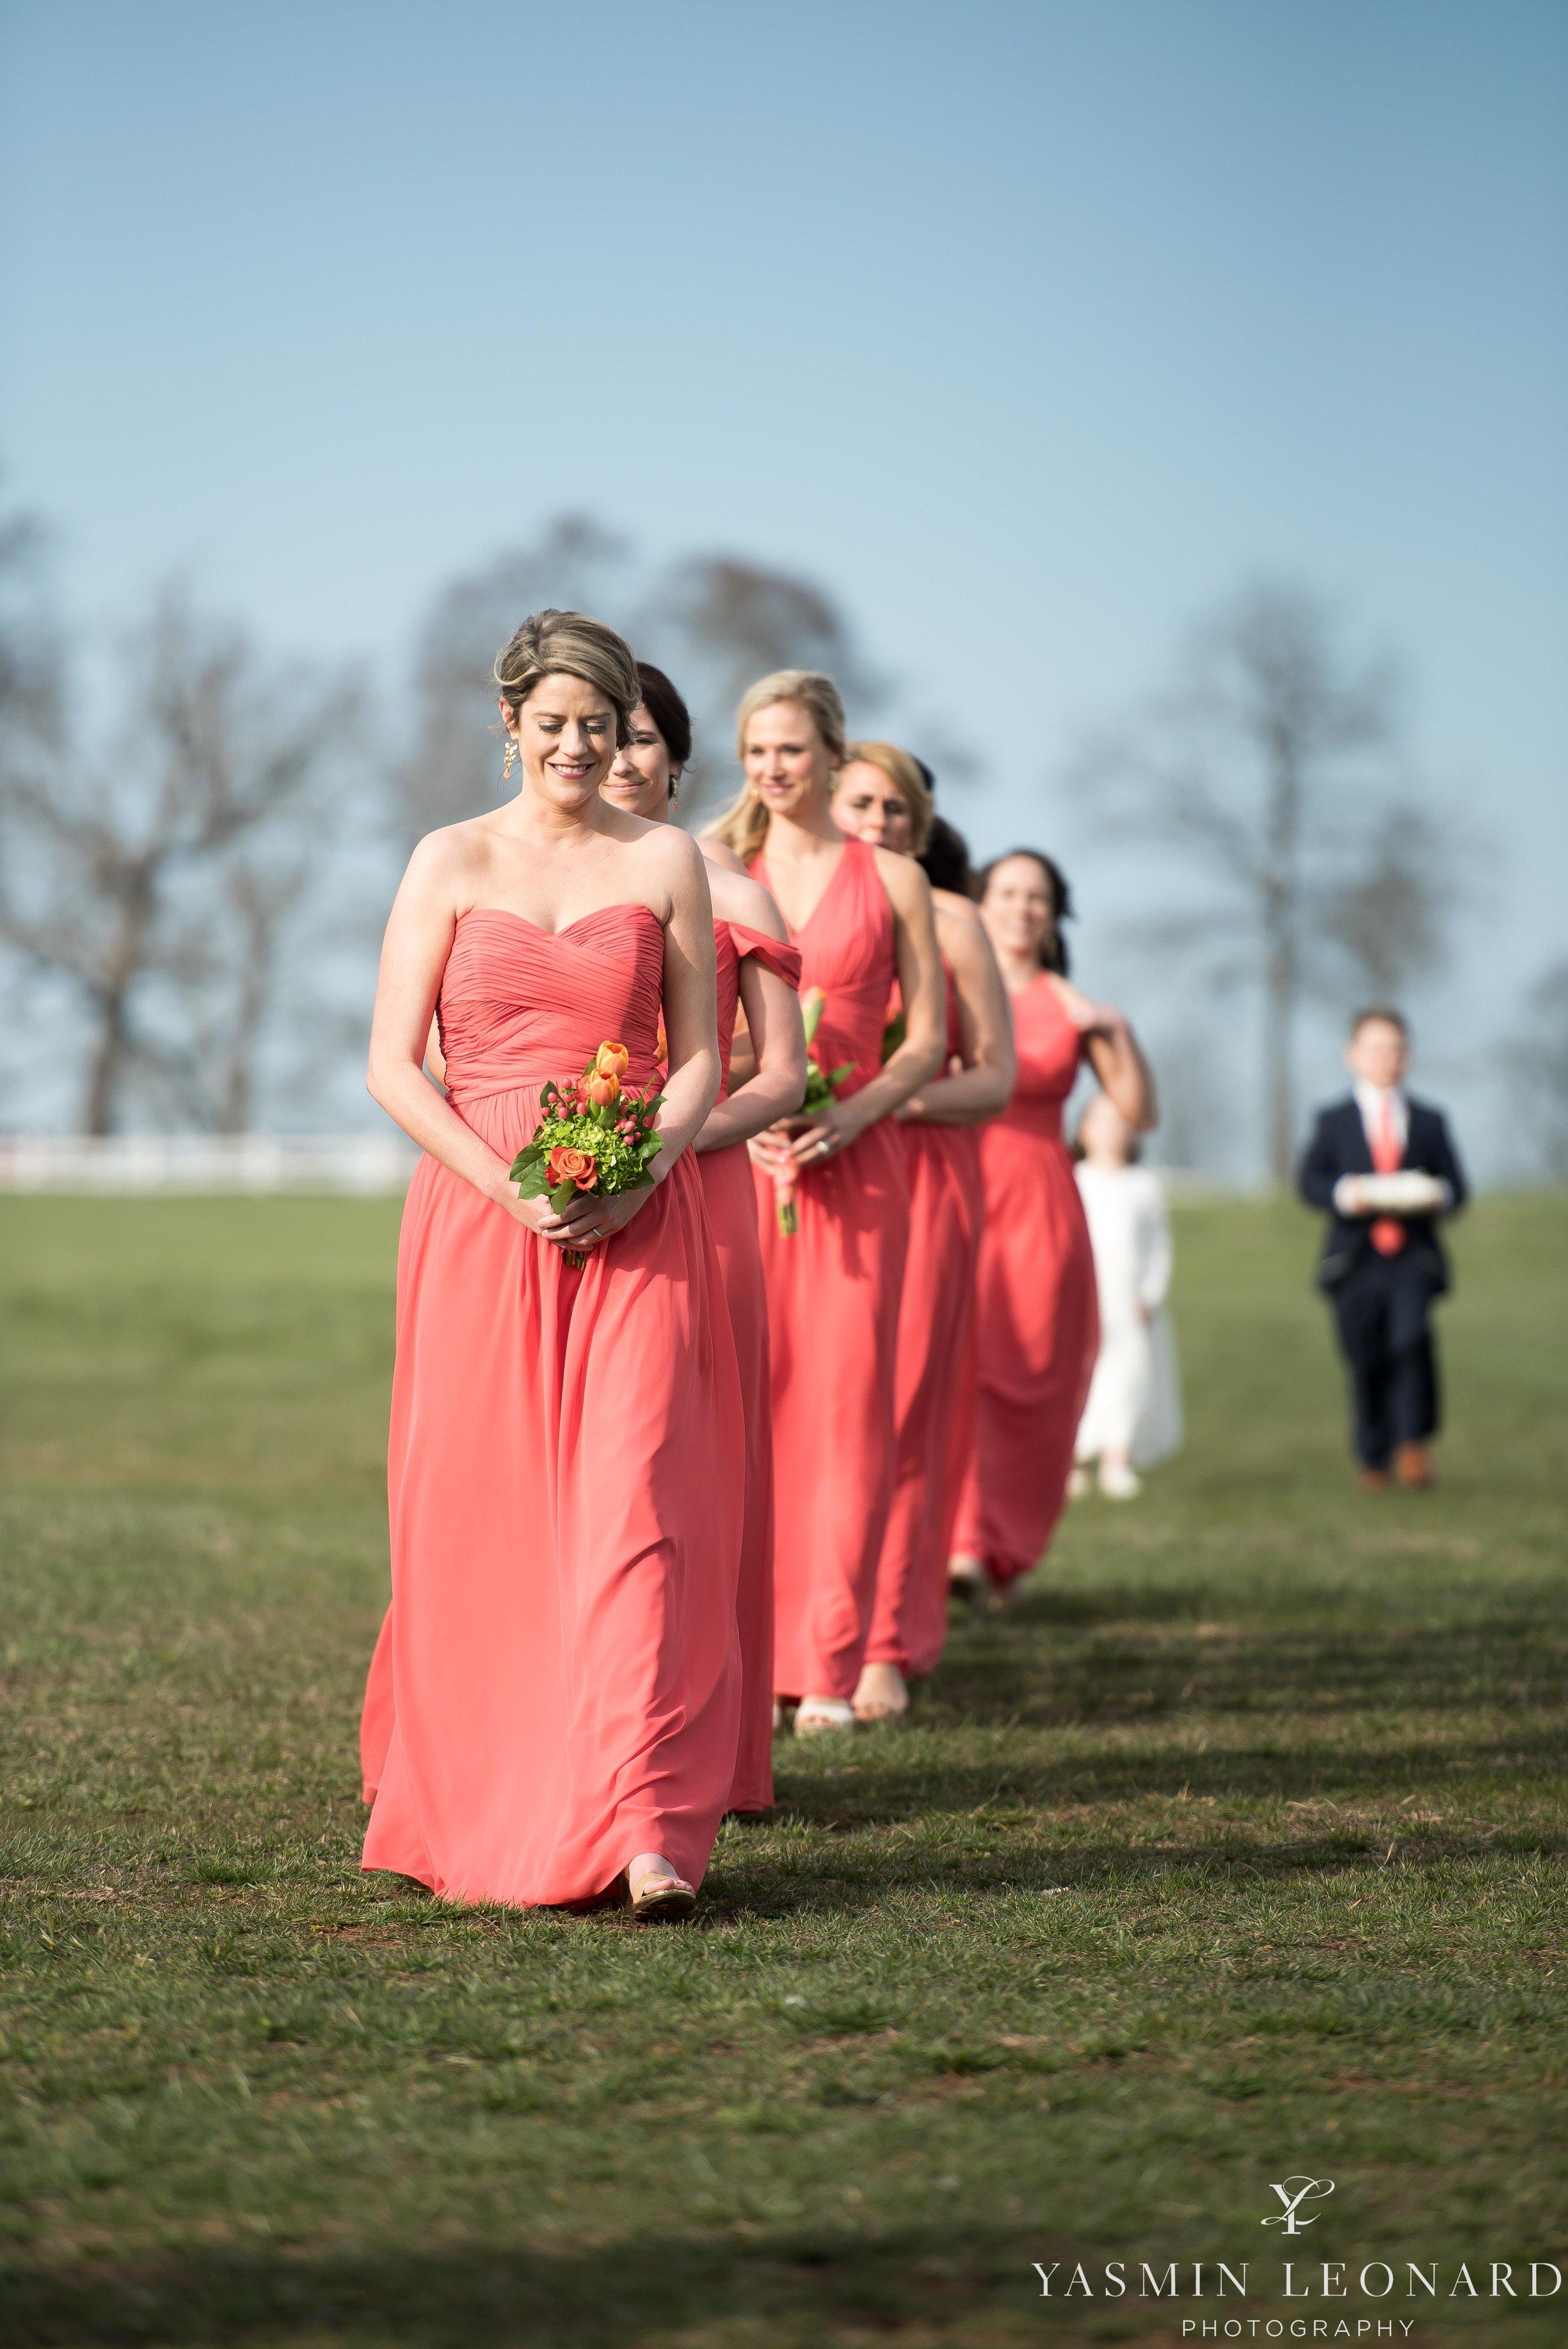 Adaumont Farm - Adaumont Farm Weddings - Trinity Weddings - NC Weddings - Yasmin Leonard Photography-24.jpg